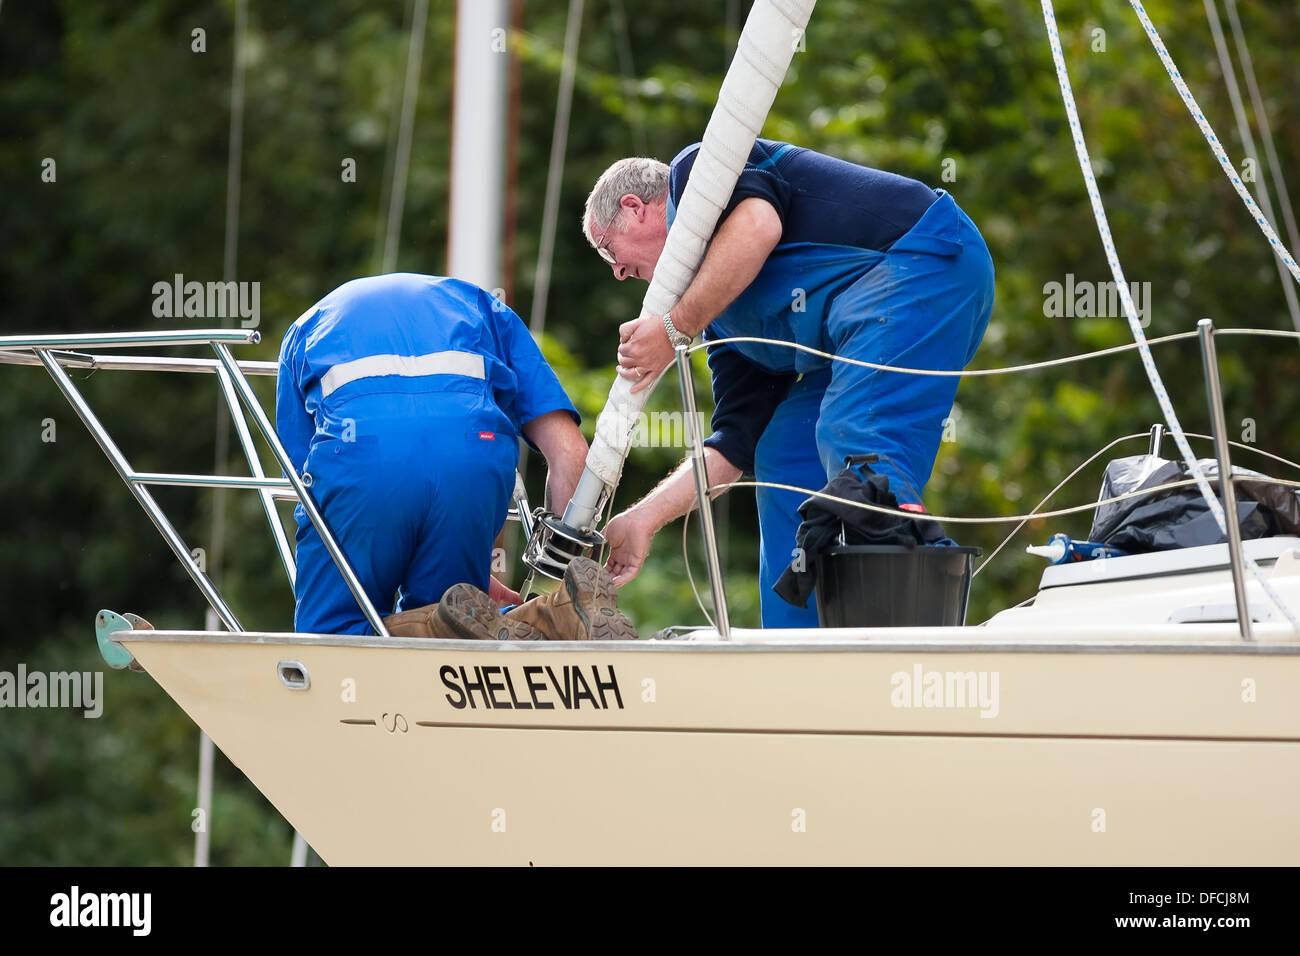 boatyard workmen fixing sail - Stock Image